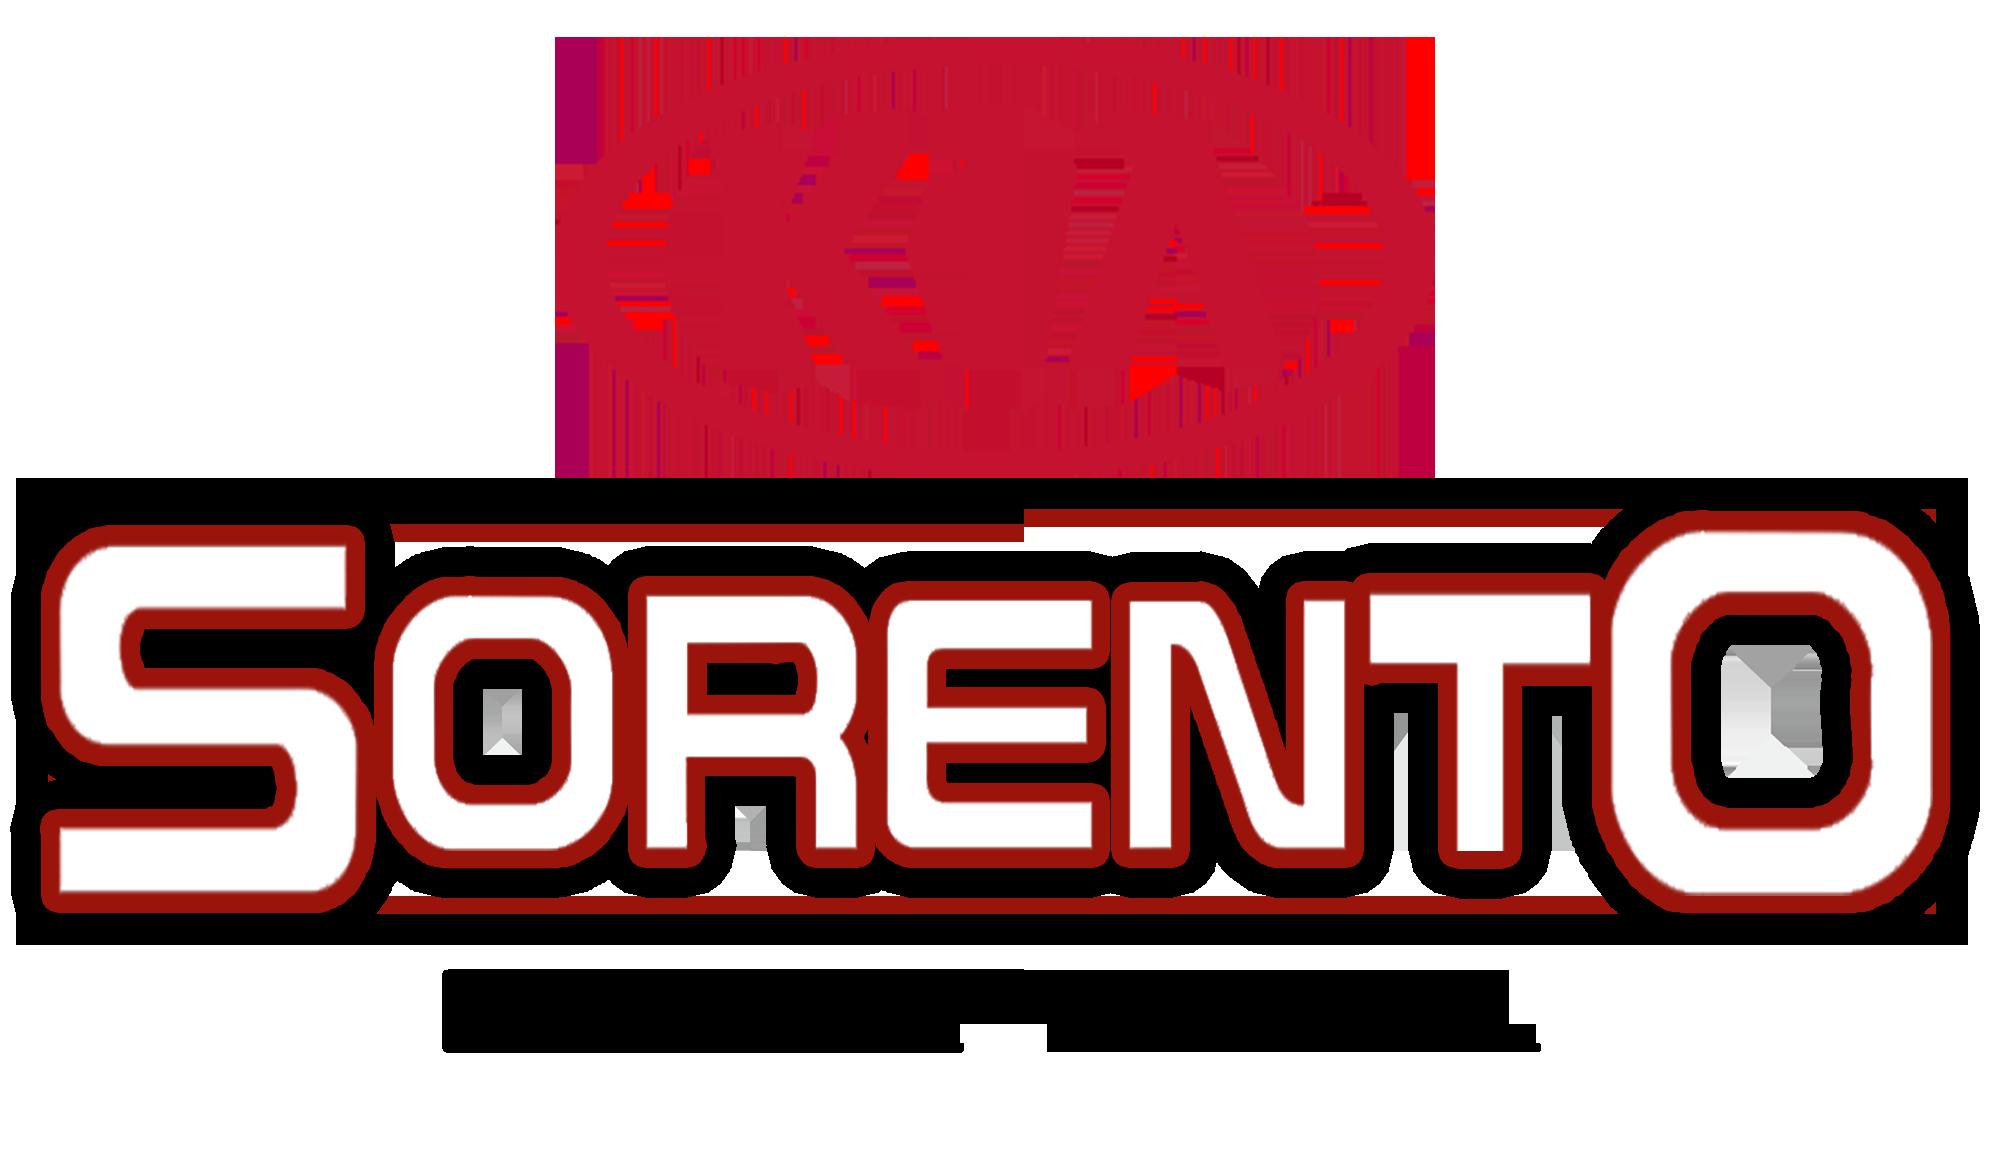 kia логотип: